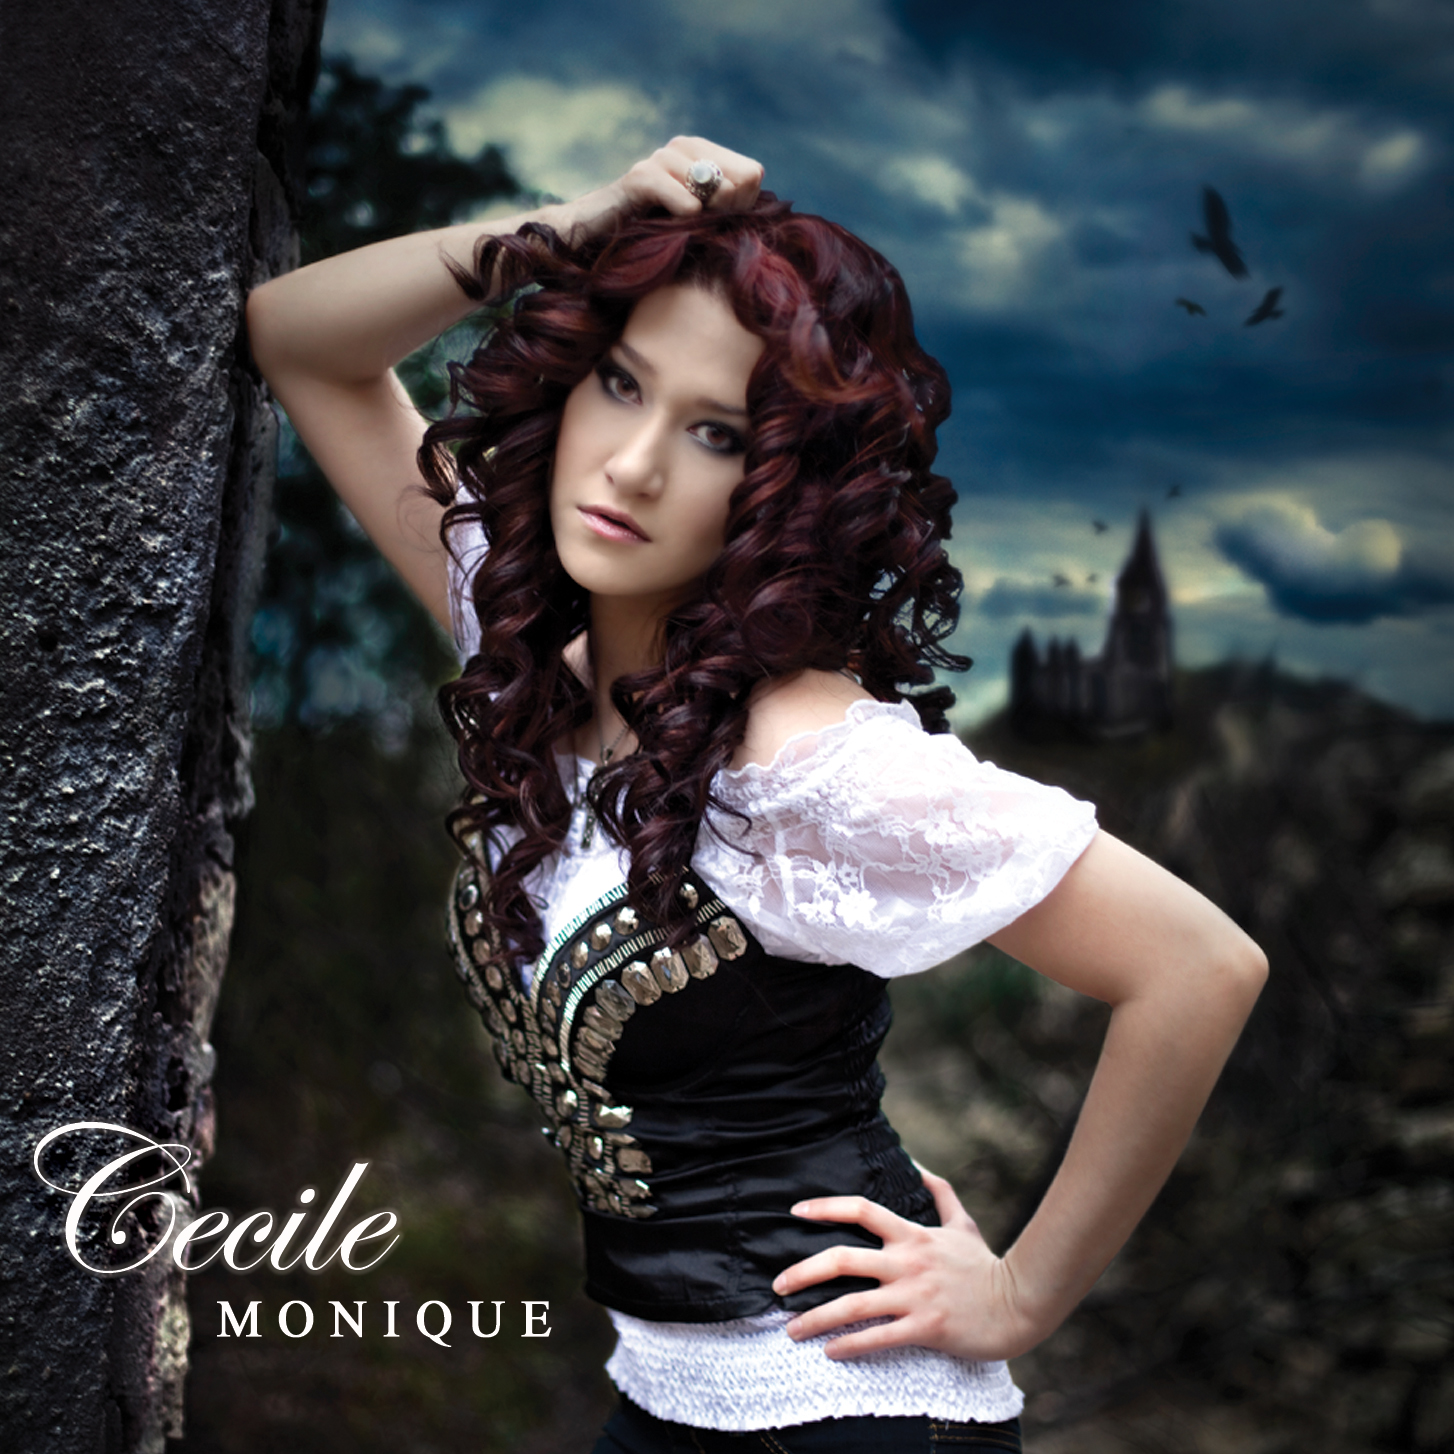 http://1.bp.blogspot.com/-xy2L2FKnCPo/UO2aWA9eSvI/AAAAAAAAAIM/Zdz57lygRNk/s1600/A+Cecile+Monique+%5BEP%5D.jpg